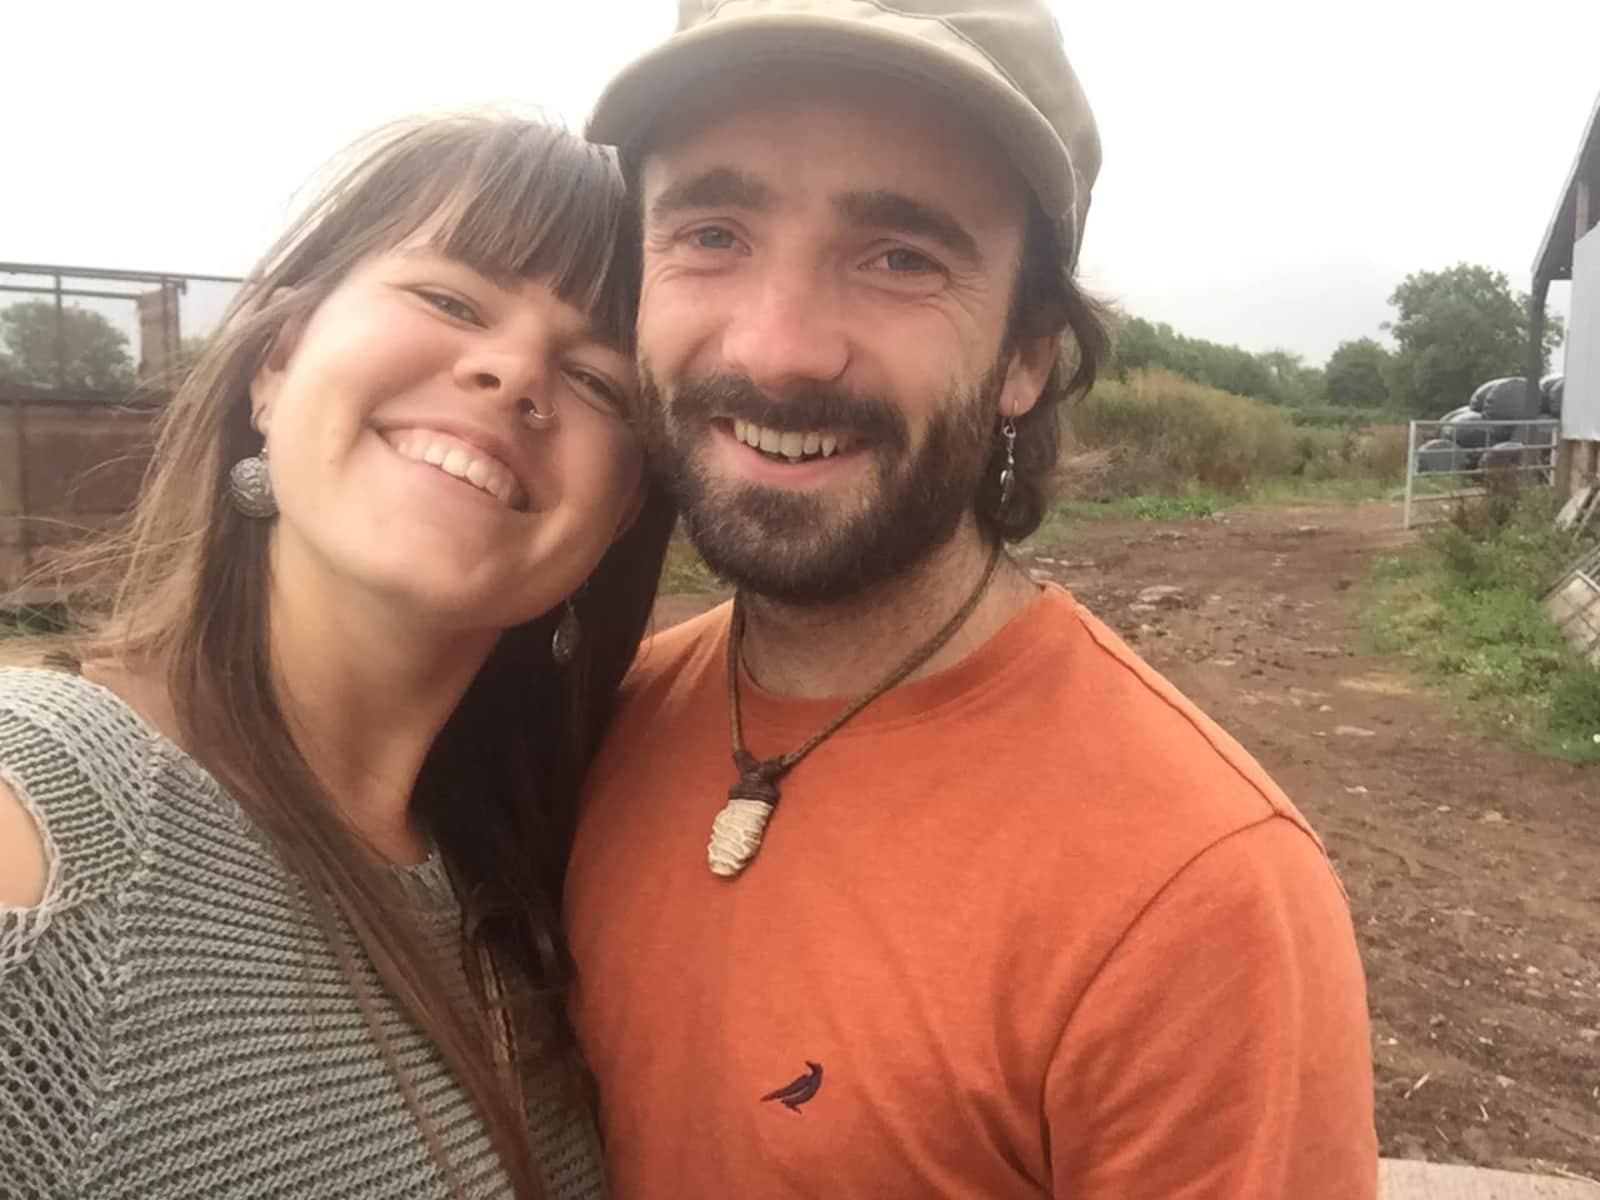 Jya and colin & Colin from Glastonbury, United Kingdom